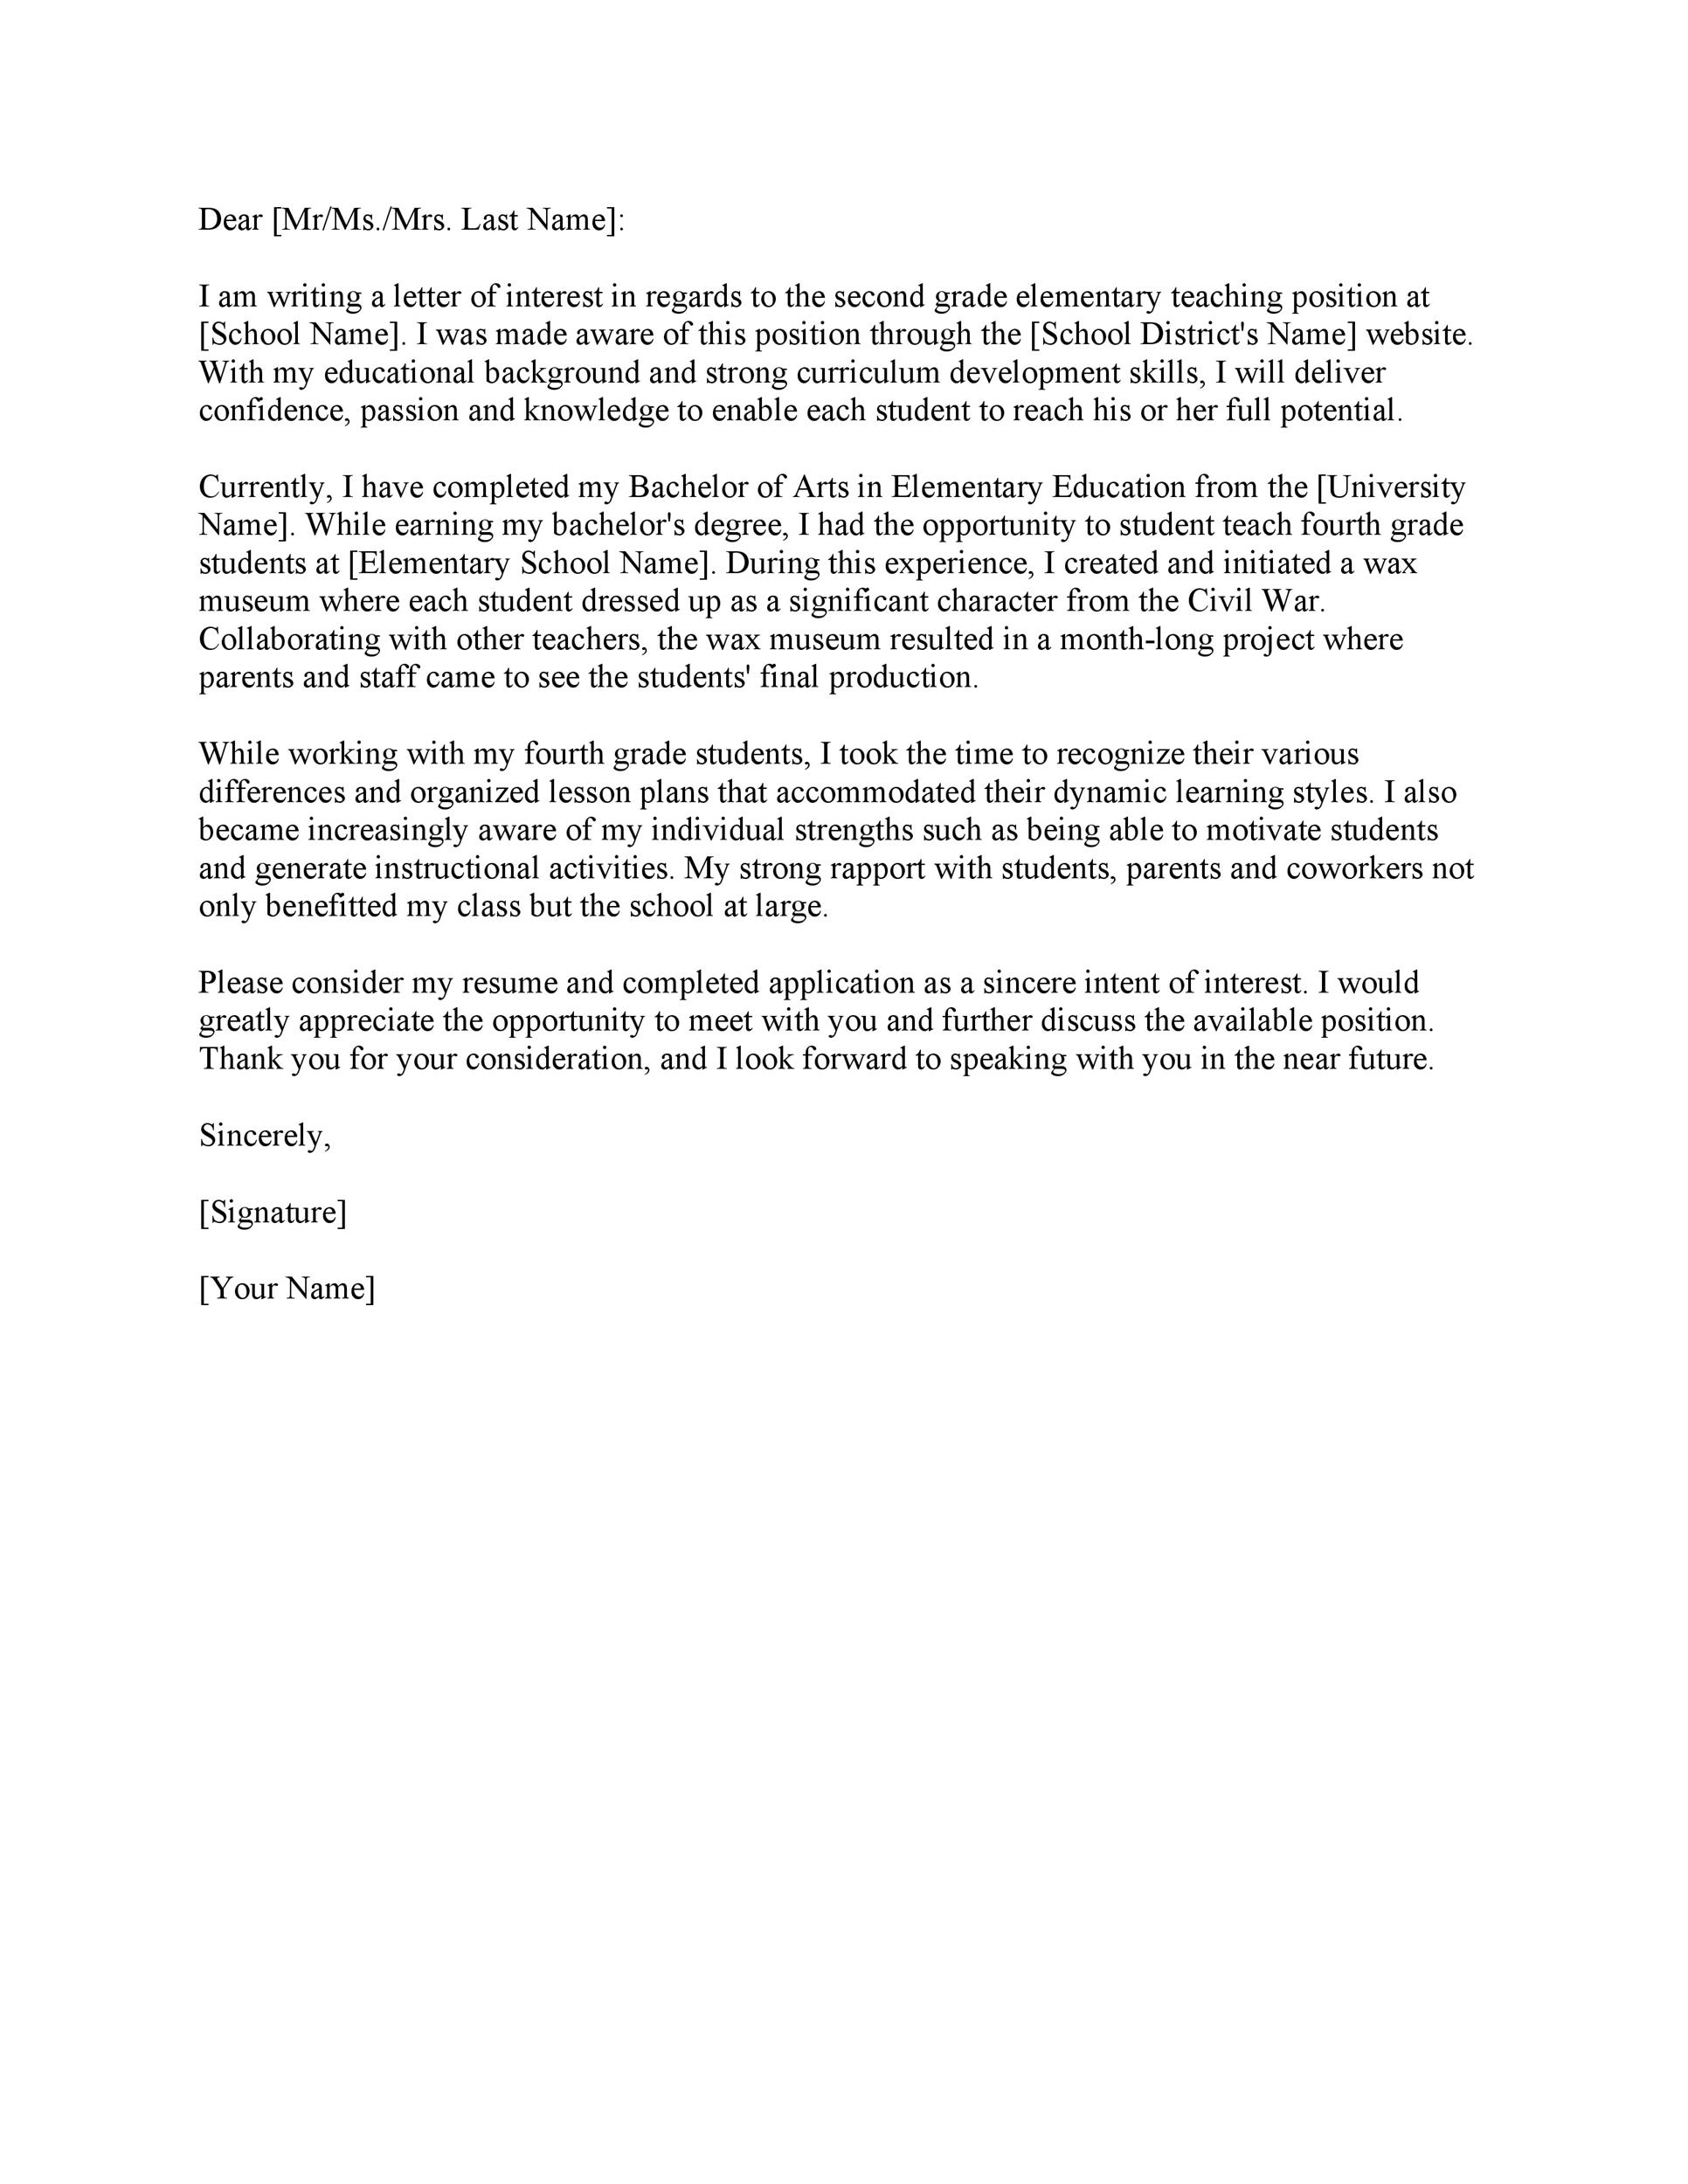 Free letter of interest 08